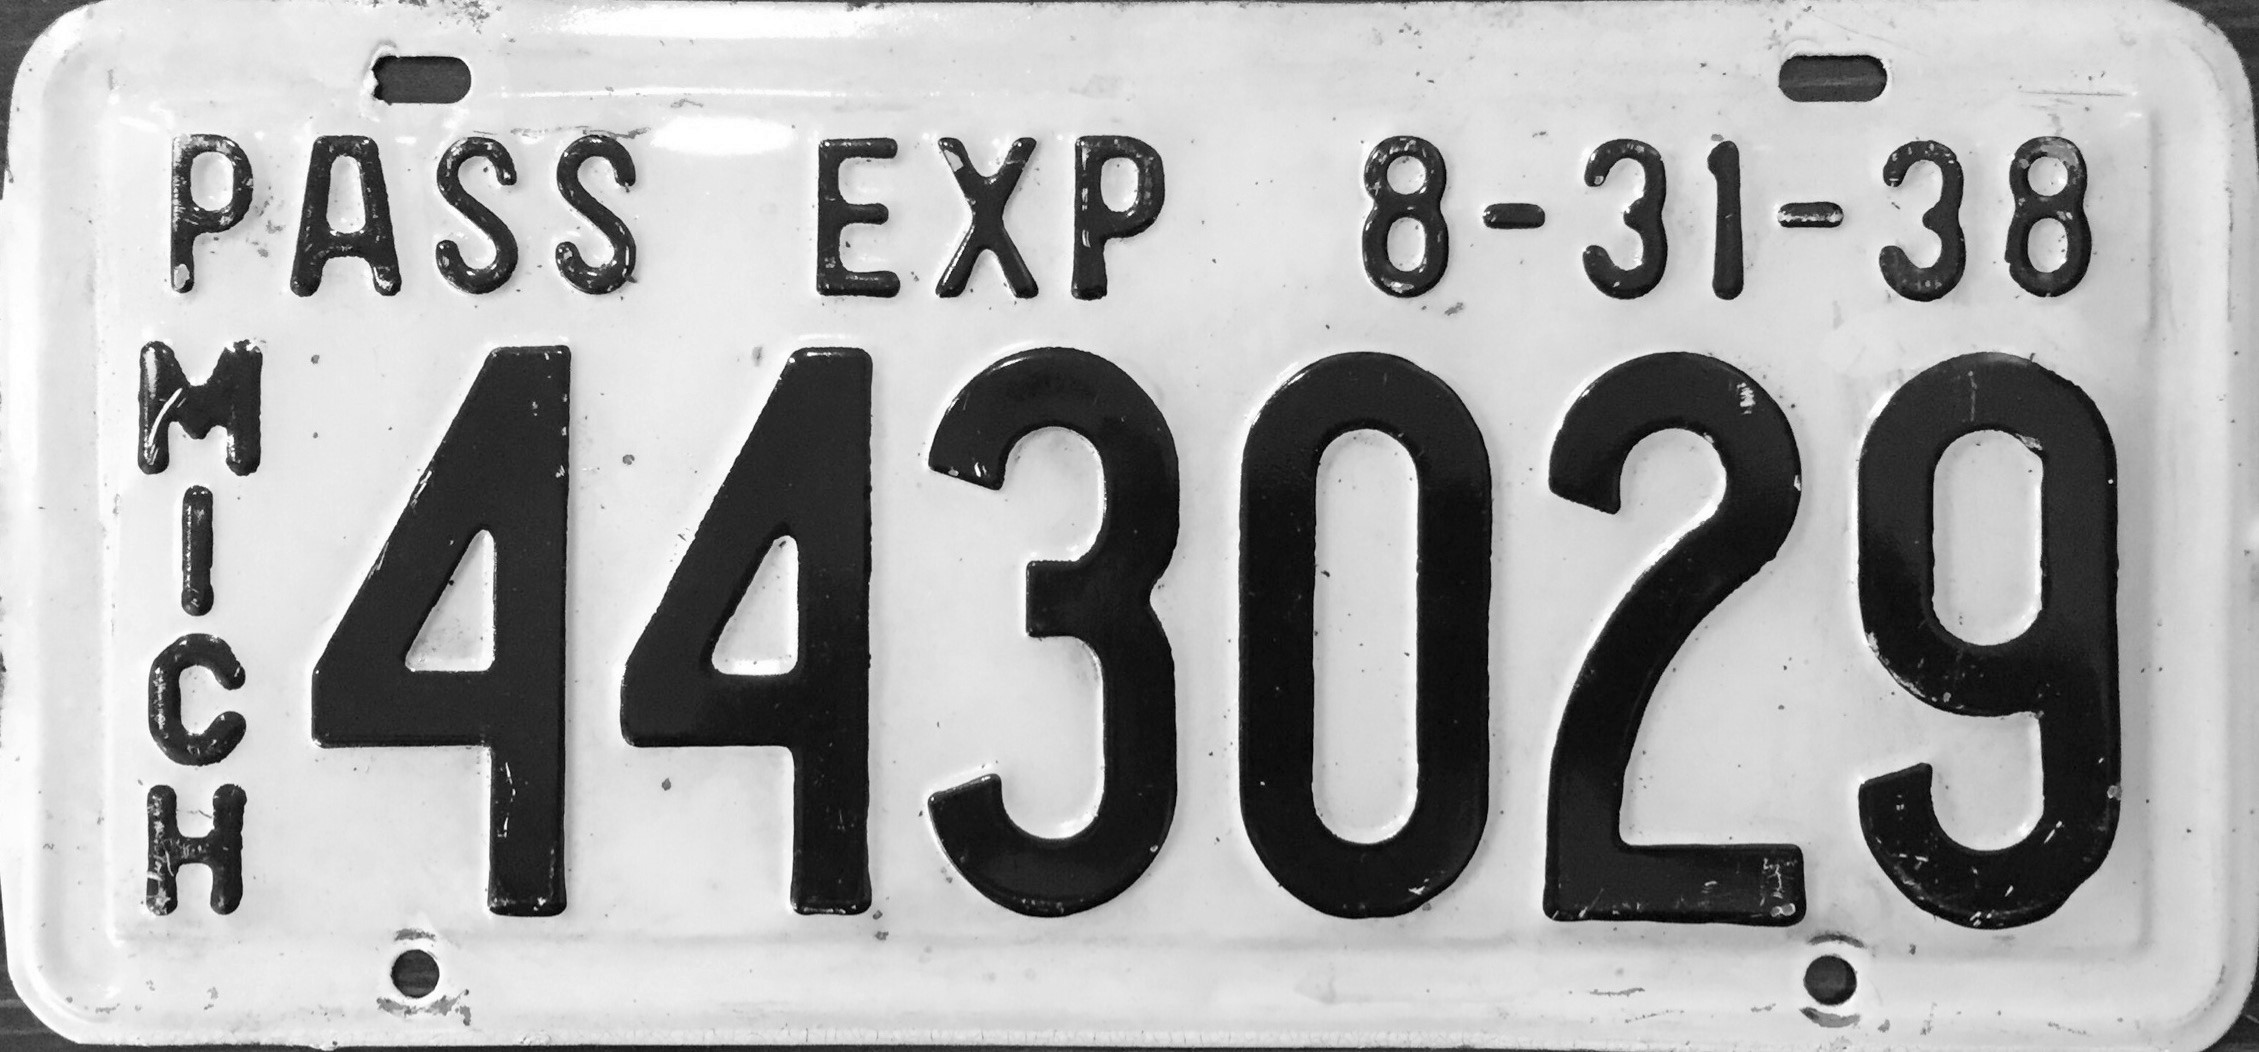 File:1938-Aug31 Michigan license plate.jpg - Wikimedia Commons